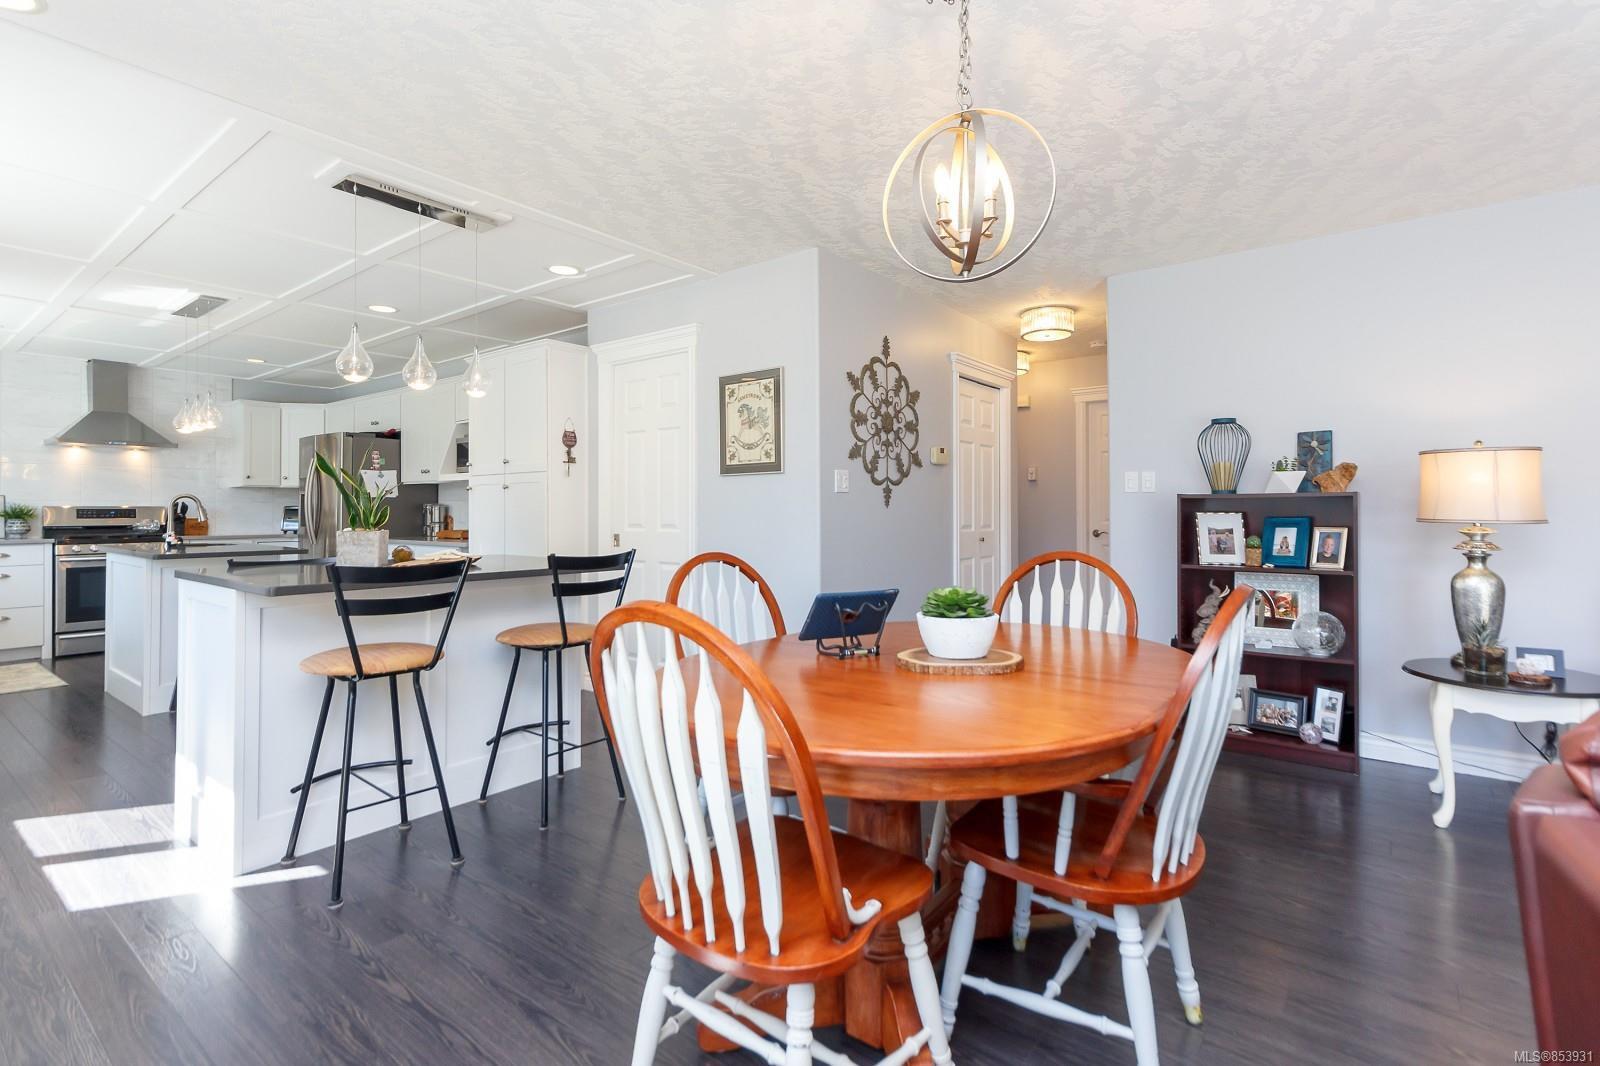 Photo 6: Photos: 2456 Timbercrest Dr in : Du East Duncan House for sale (Duncan)  : MLS®# 853931